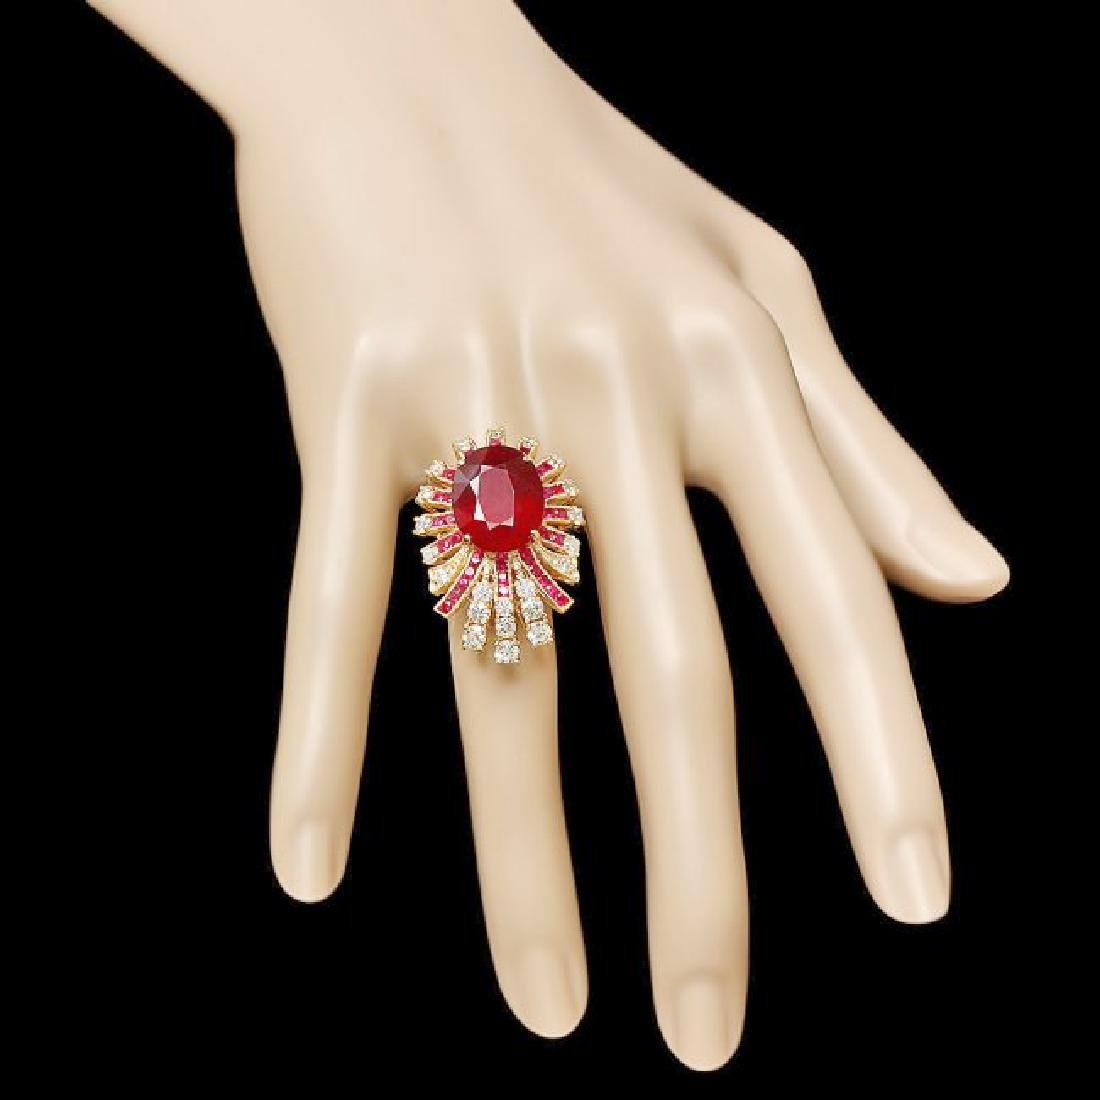 14k Yellow Gold 14ct Ruby 1.85ct Diamond Ring - 3